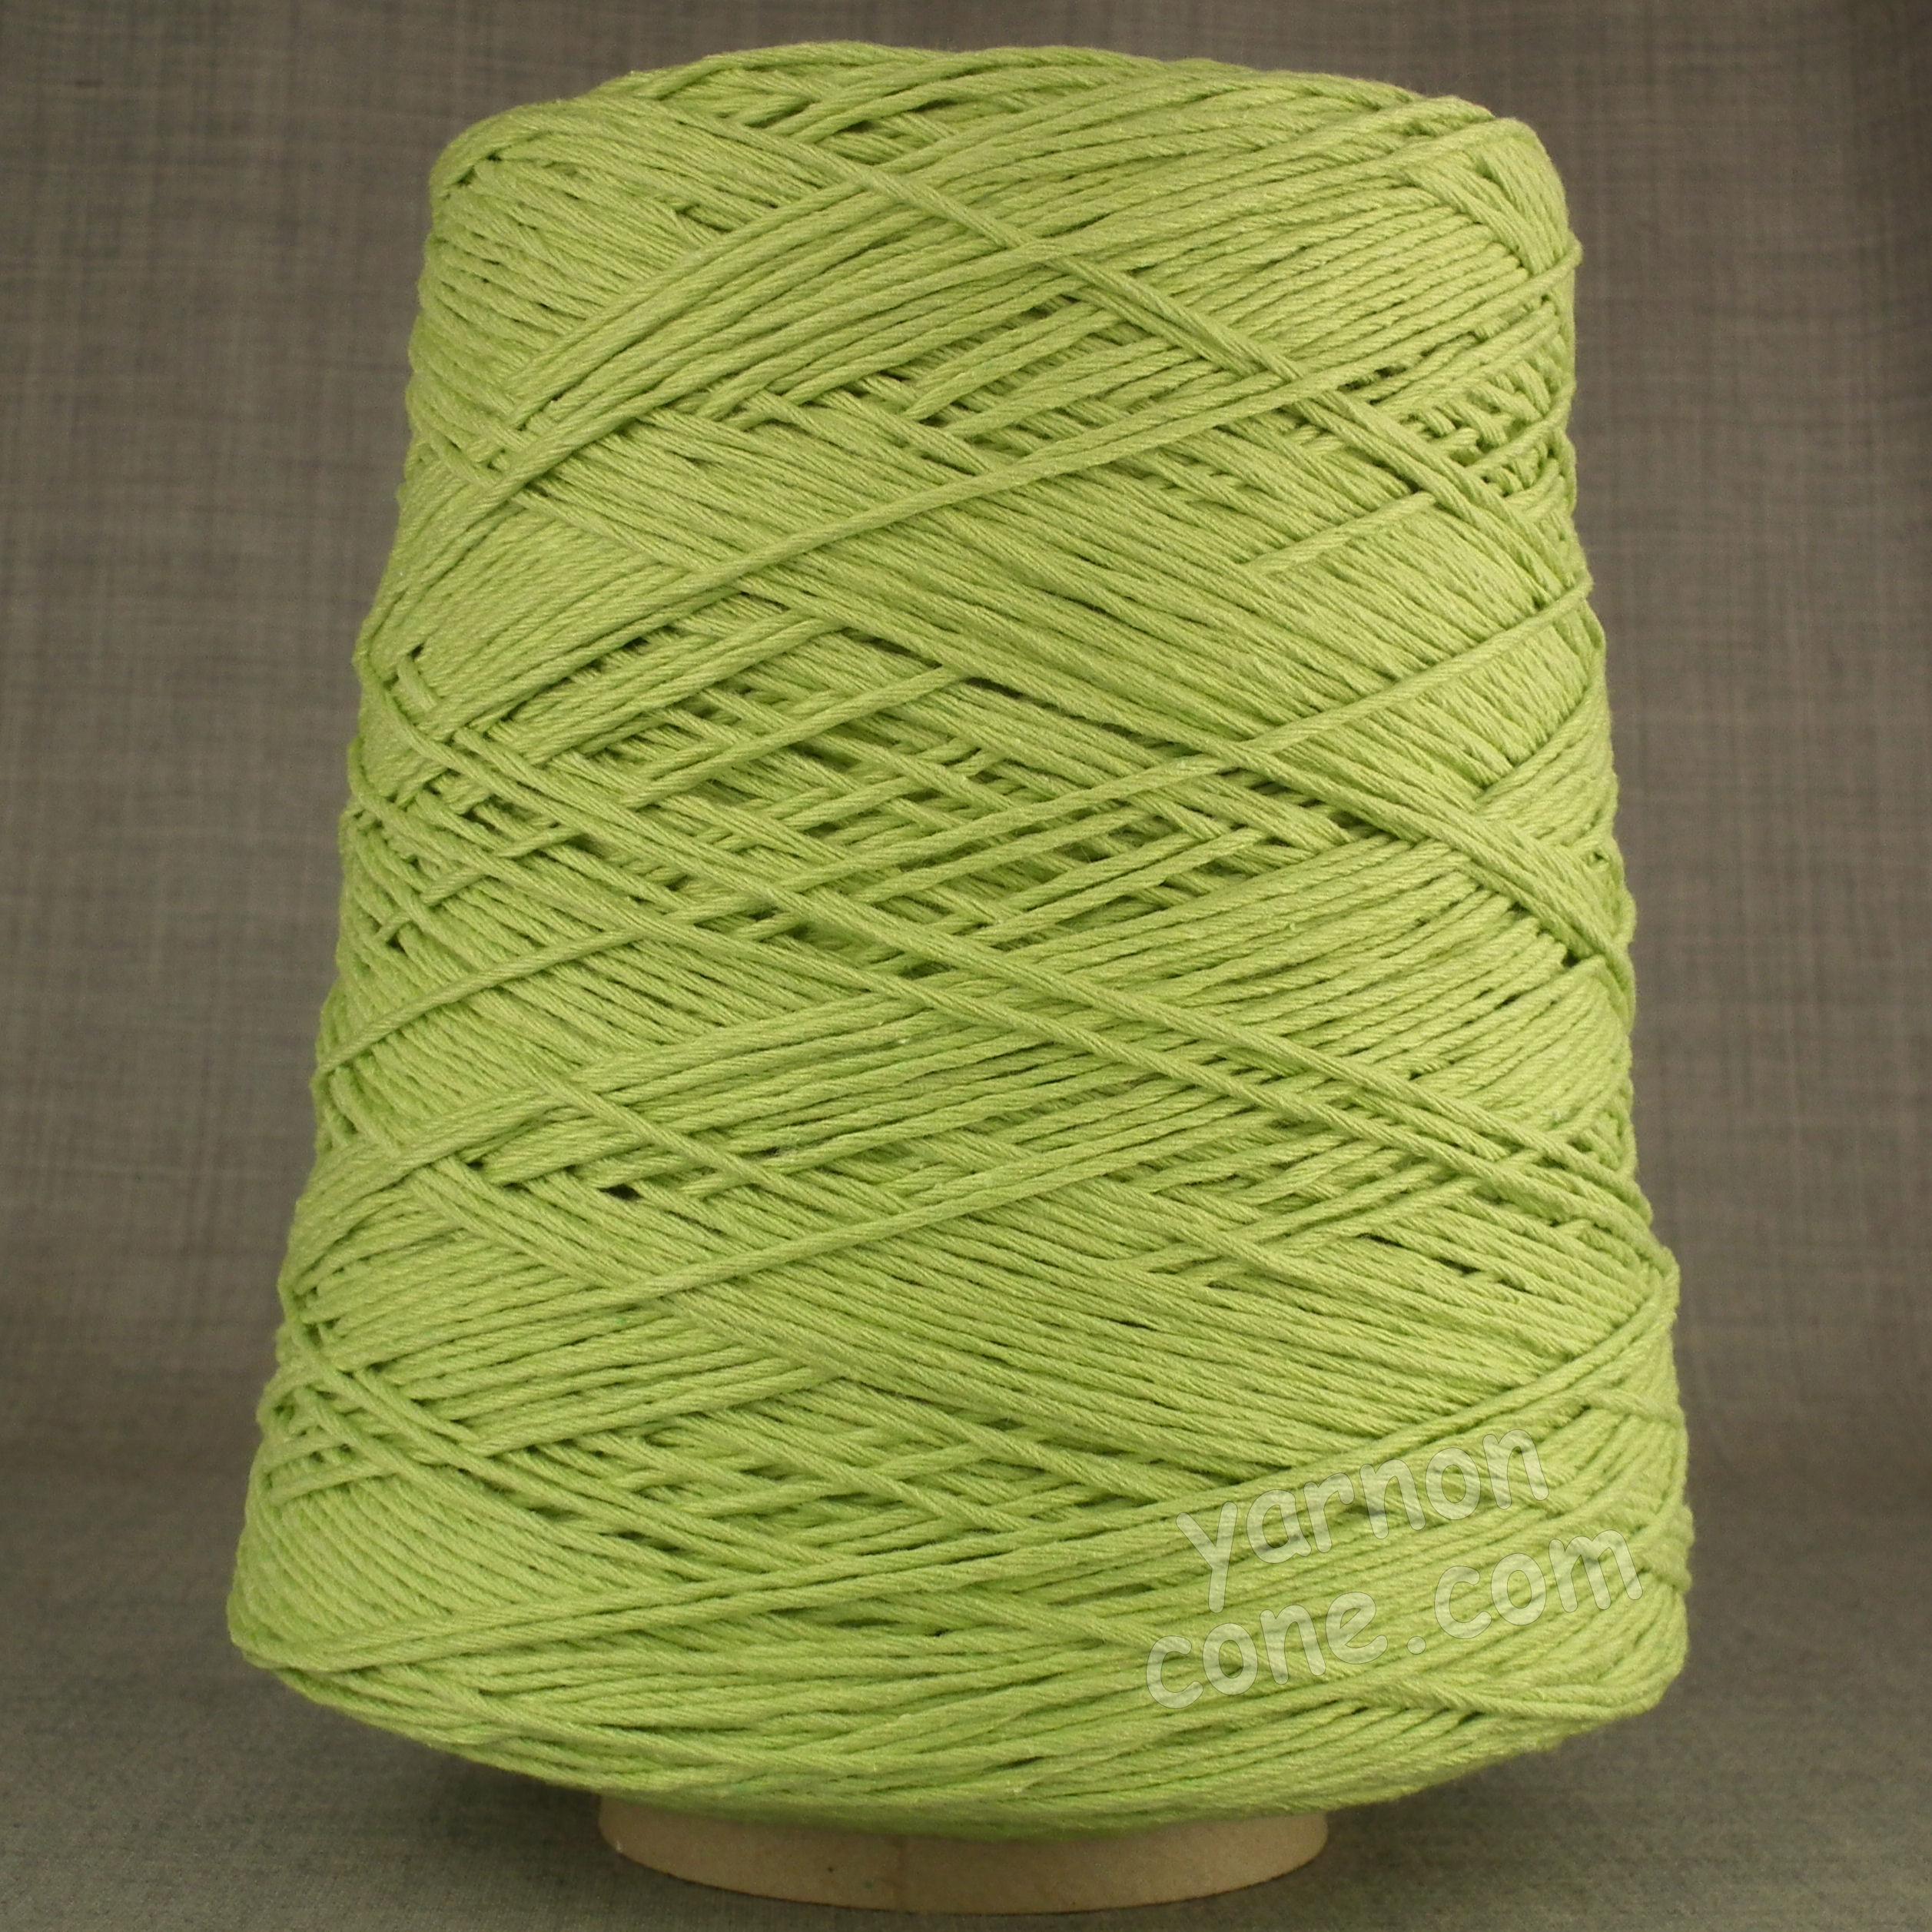 Double knitting DK soft pure cotton yarn on cone hand machine knitting weaving crochet pistachio green light